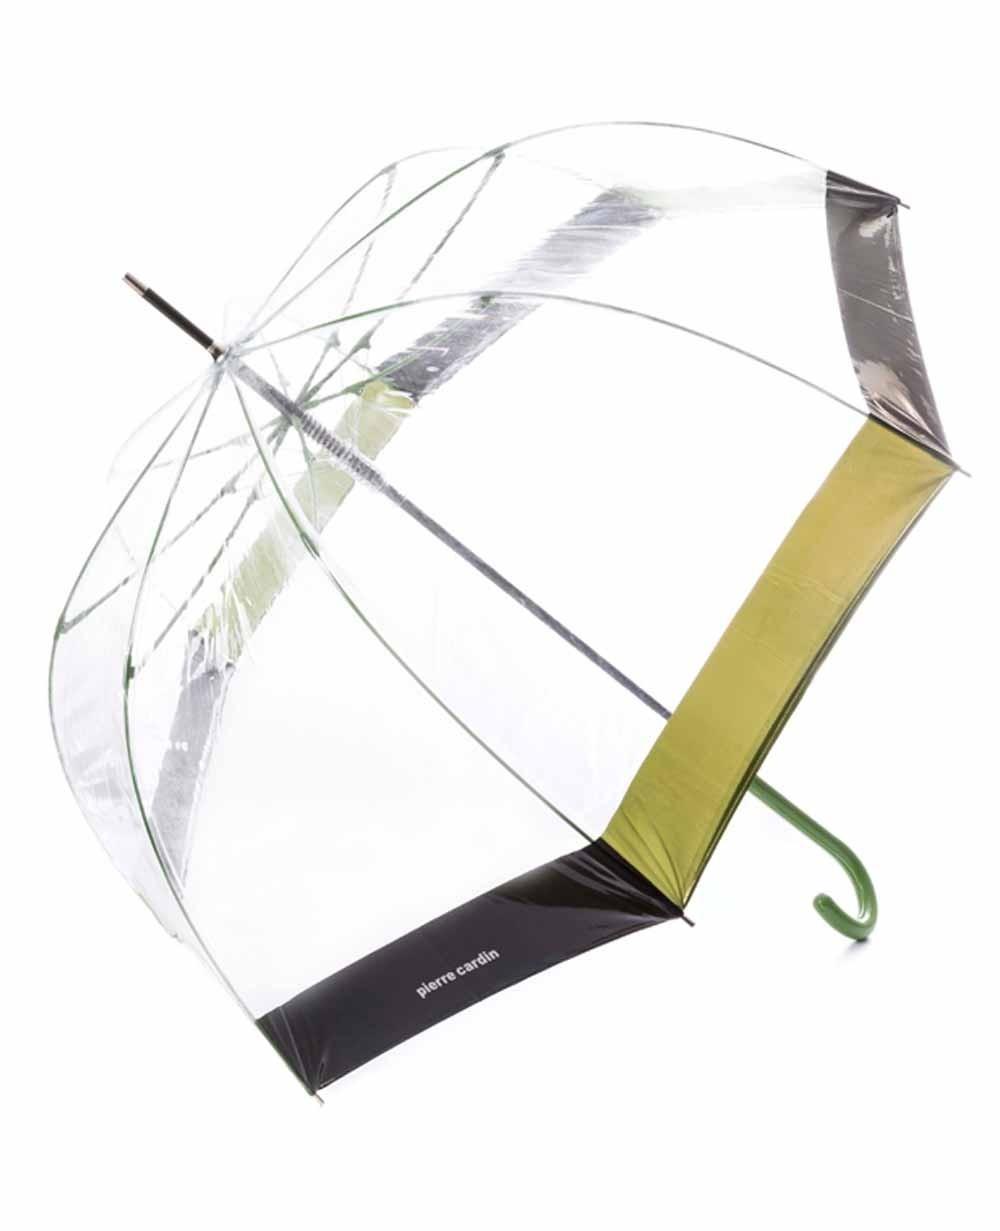 Pierre Cardin Paraguas largo automático Transparente (Foto )